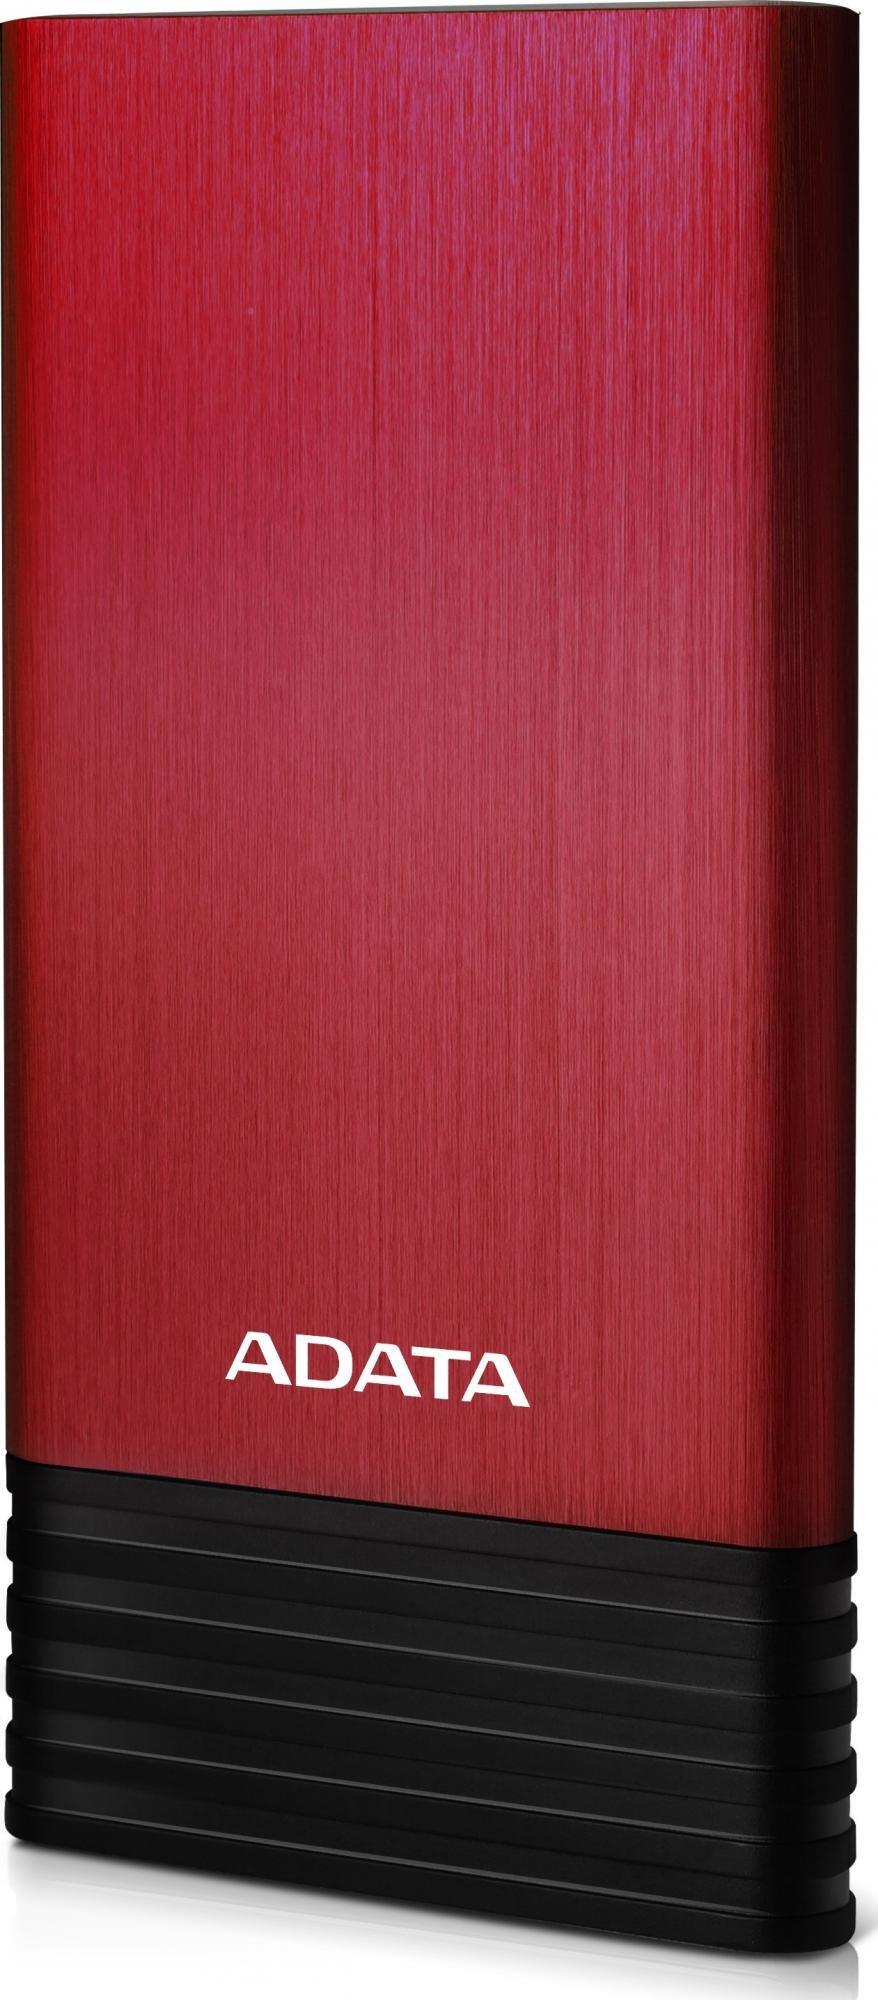 ADATA X7000 Power Bank 7000mAh červená